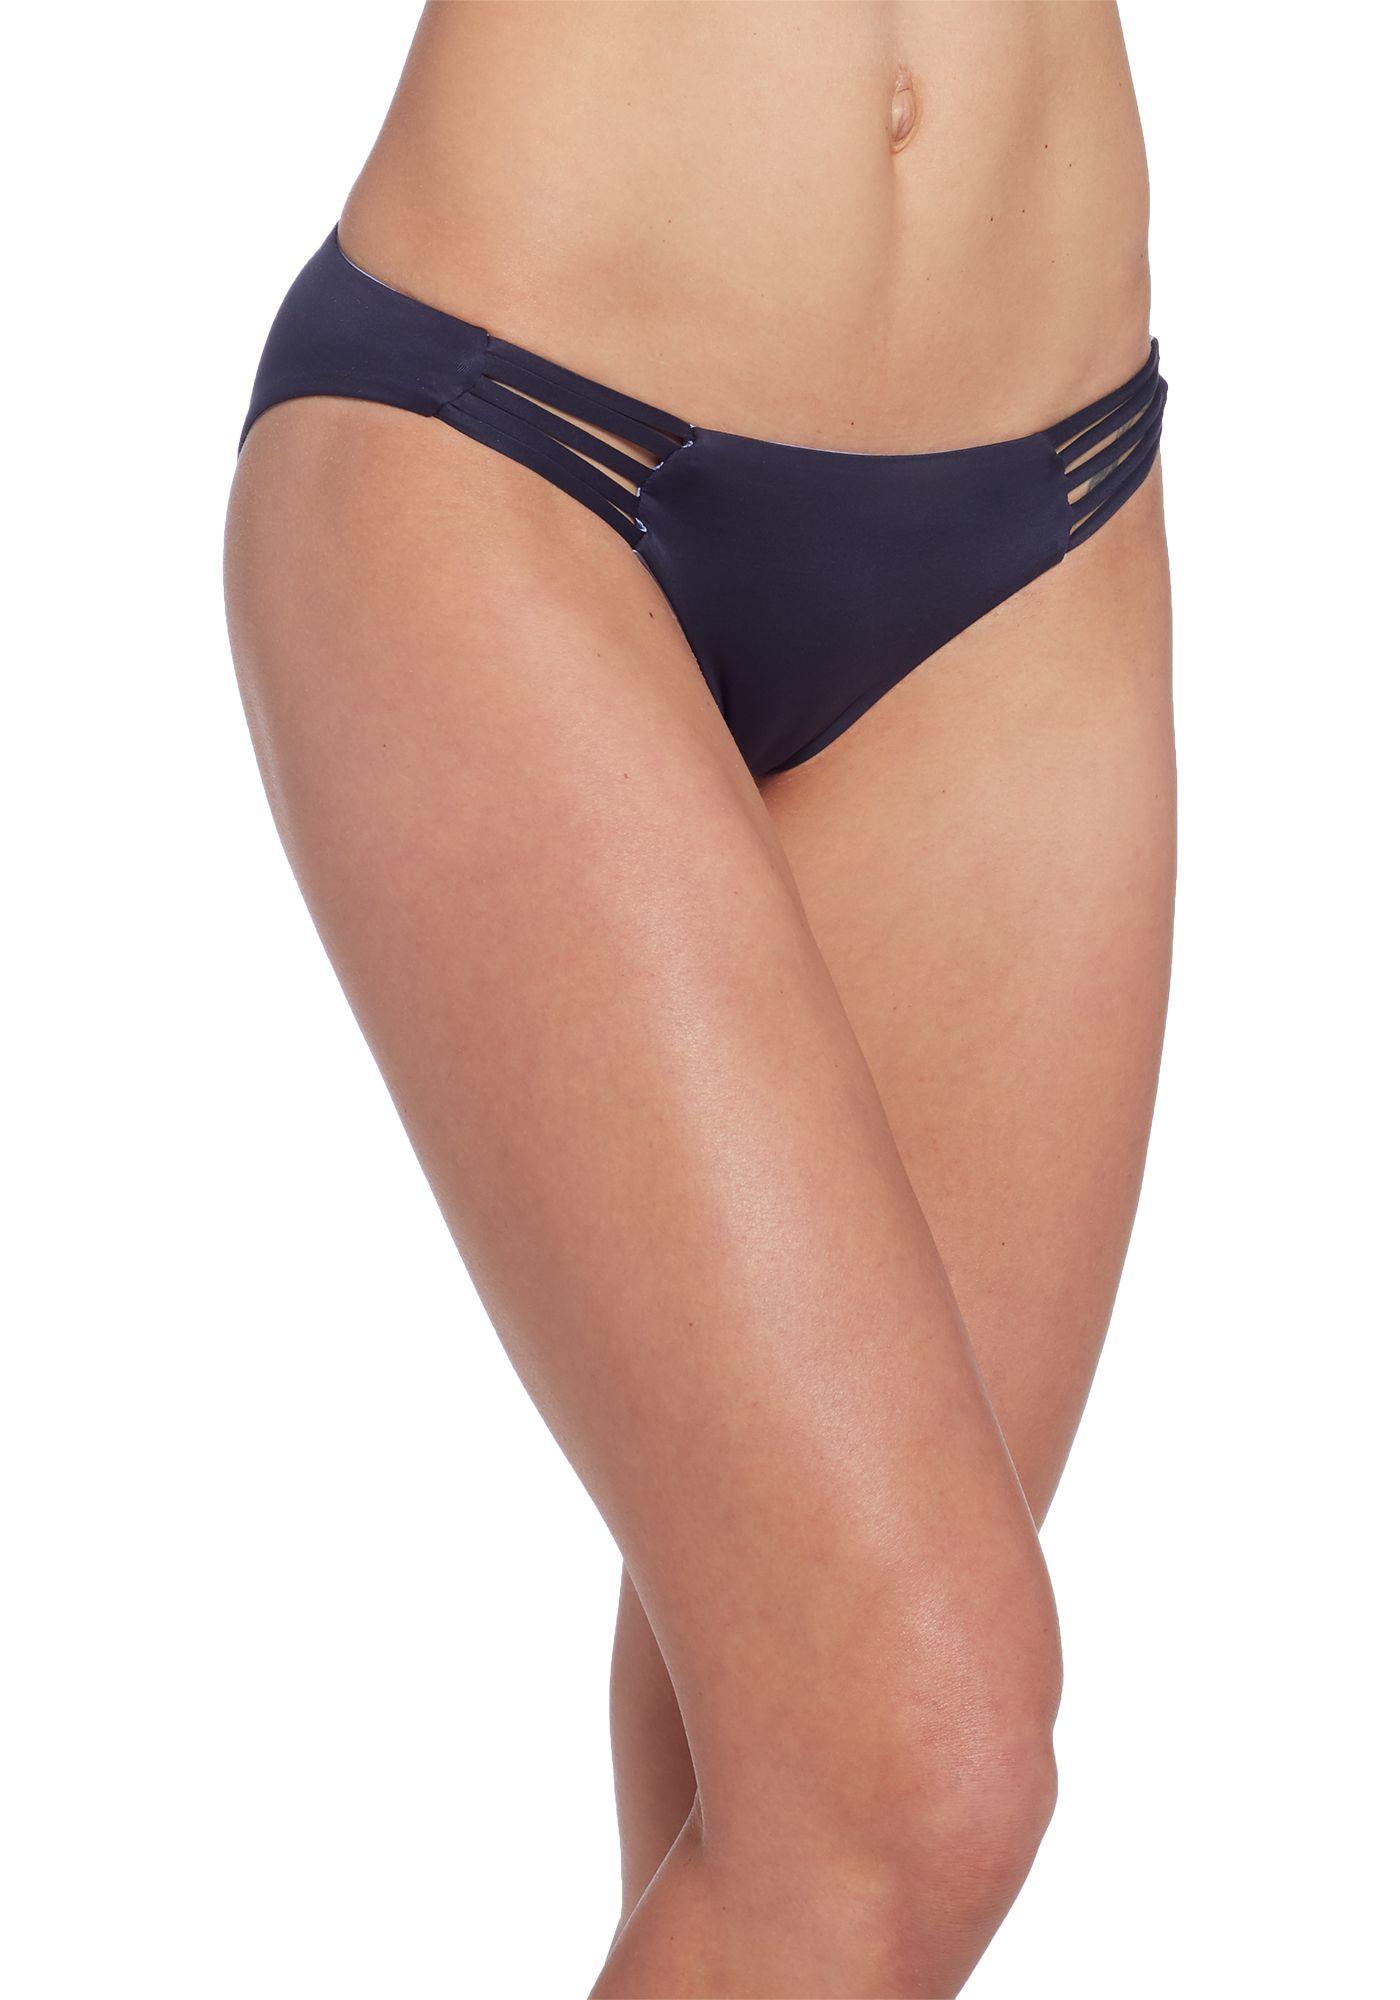 Patagonia Women's Reversible Seaglass Bay Bikini Bottoms